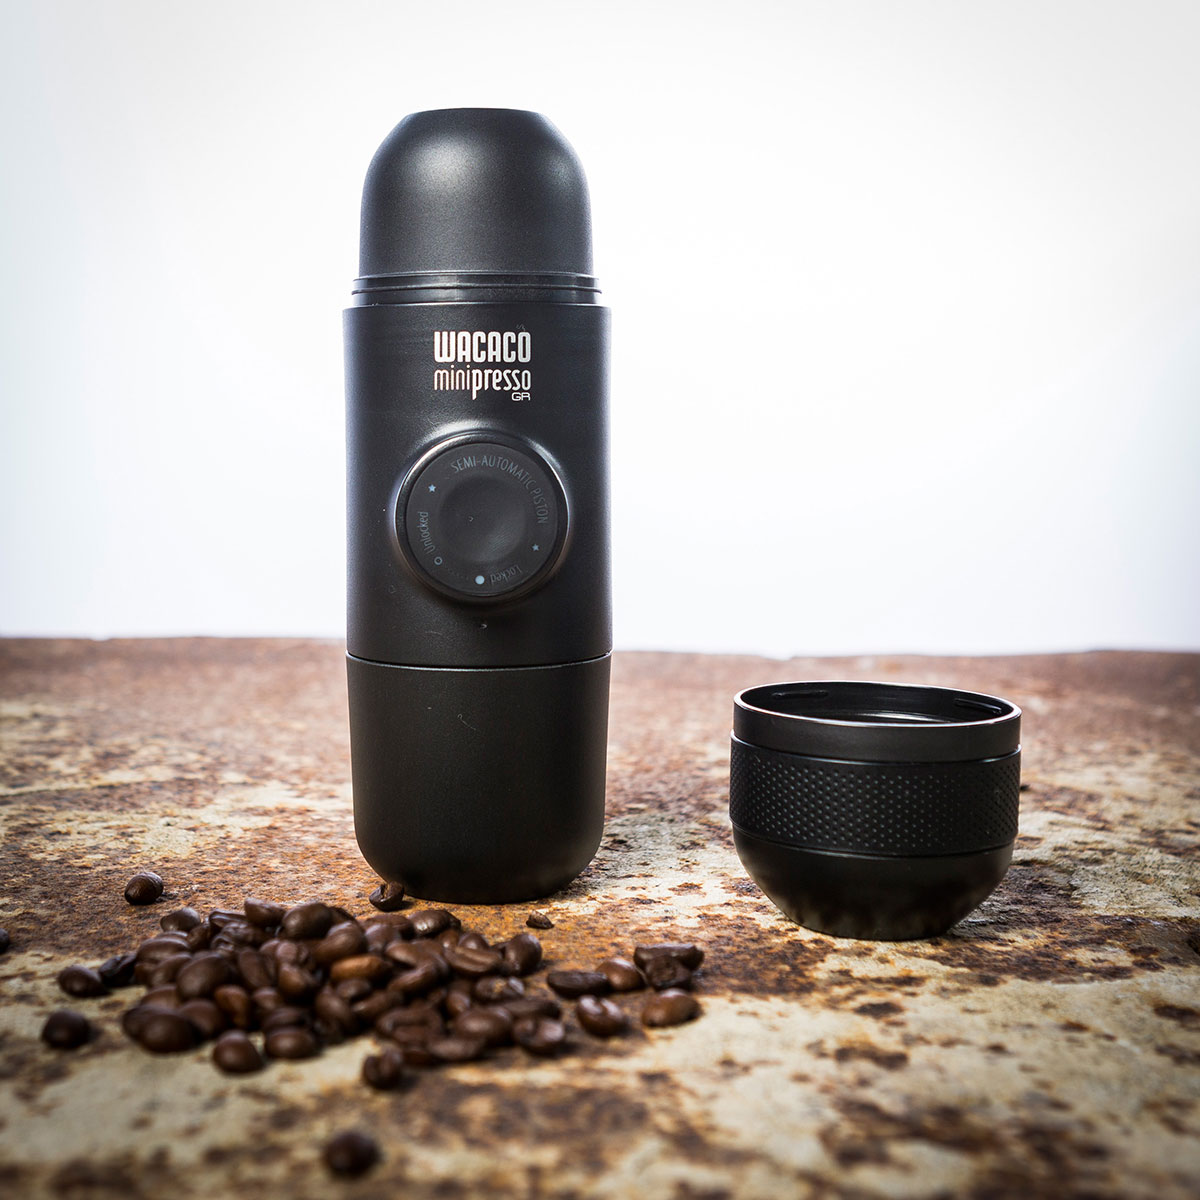 Tragbare Esspressomaschine - Minipresso